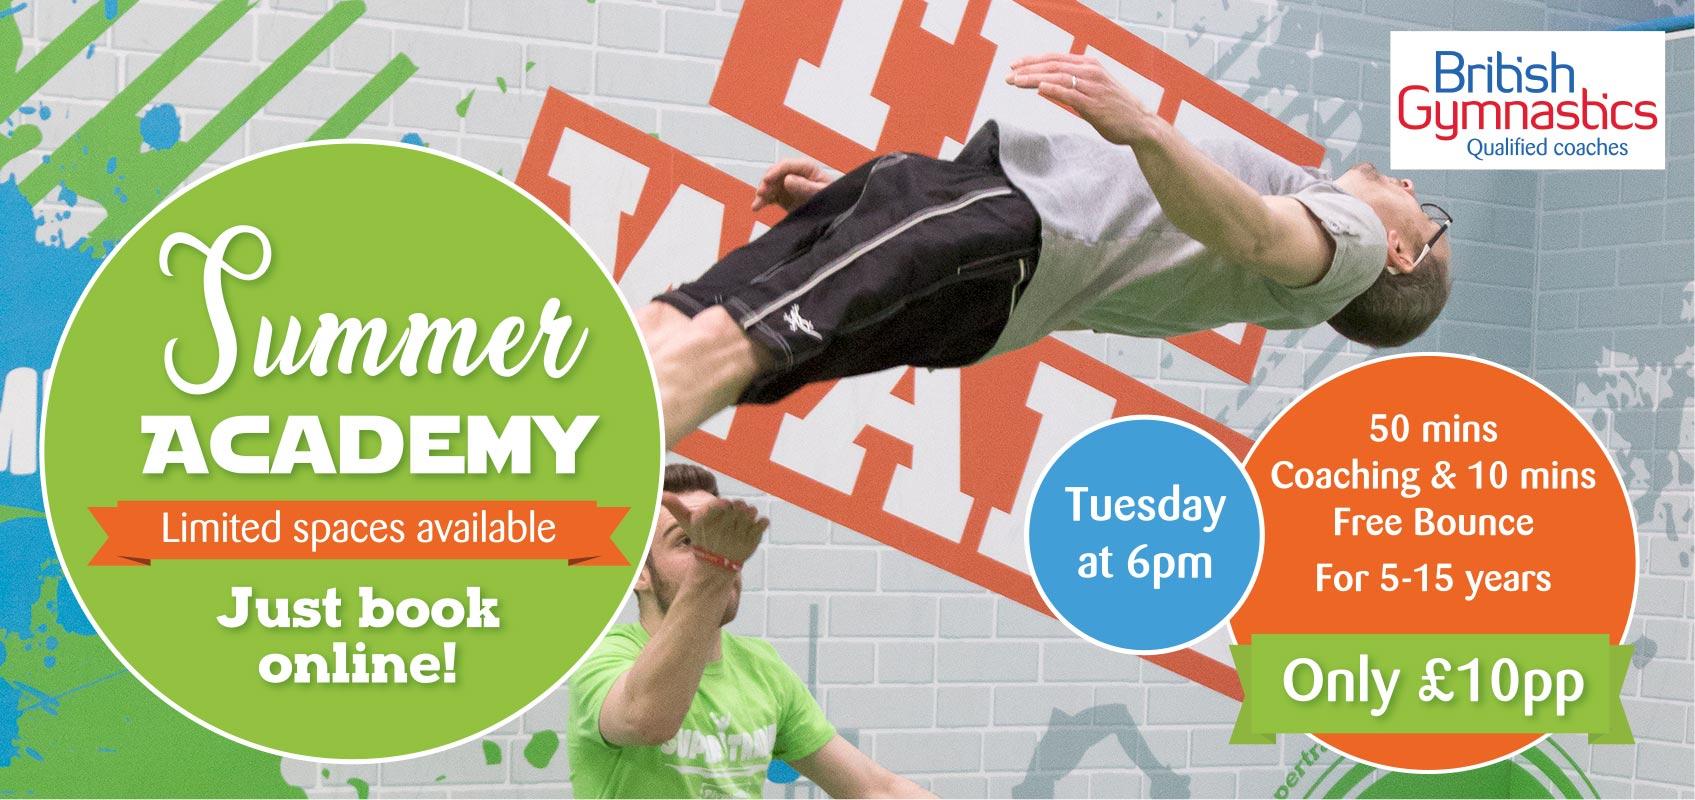 academy-hol-offer2018.jpg